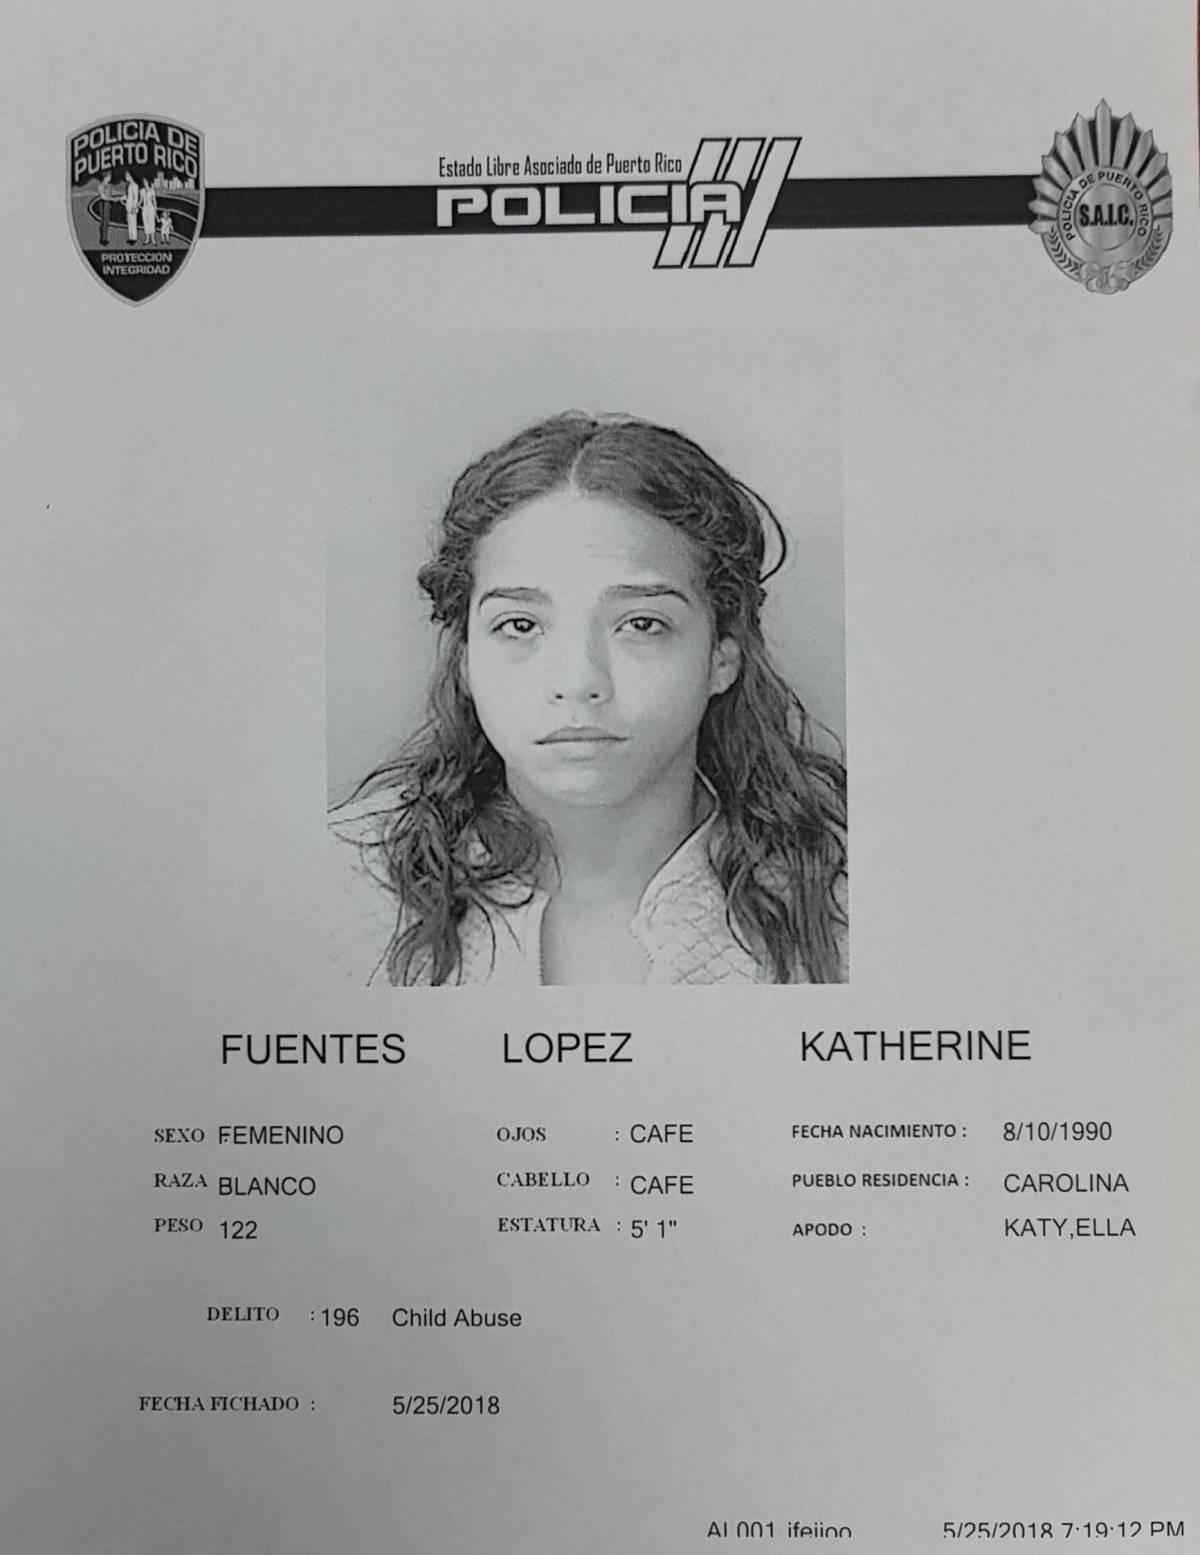 Katherine Fuentes López